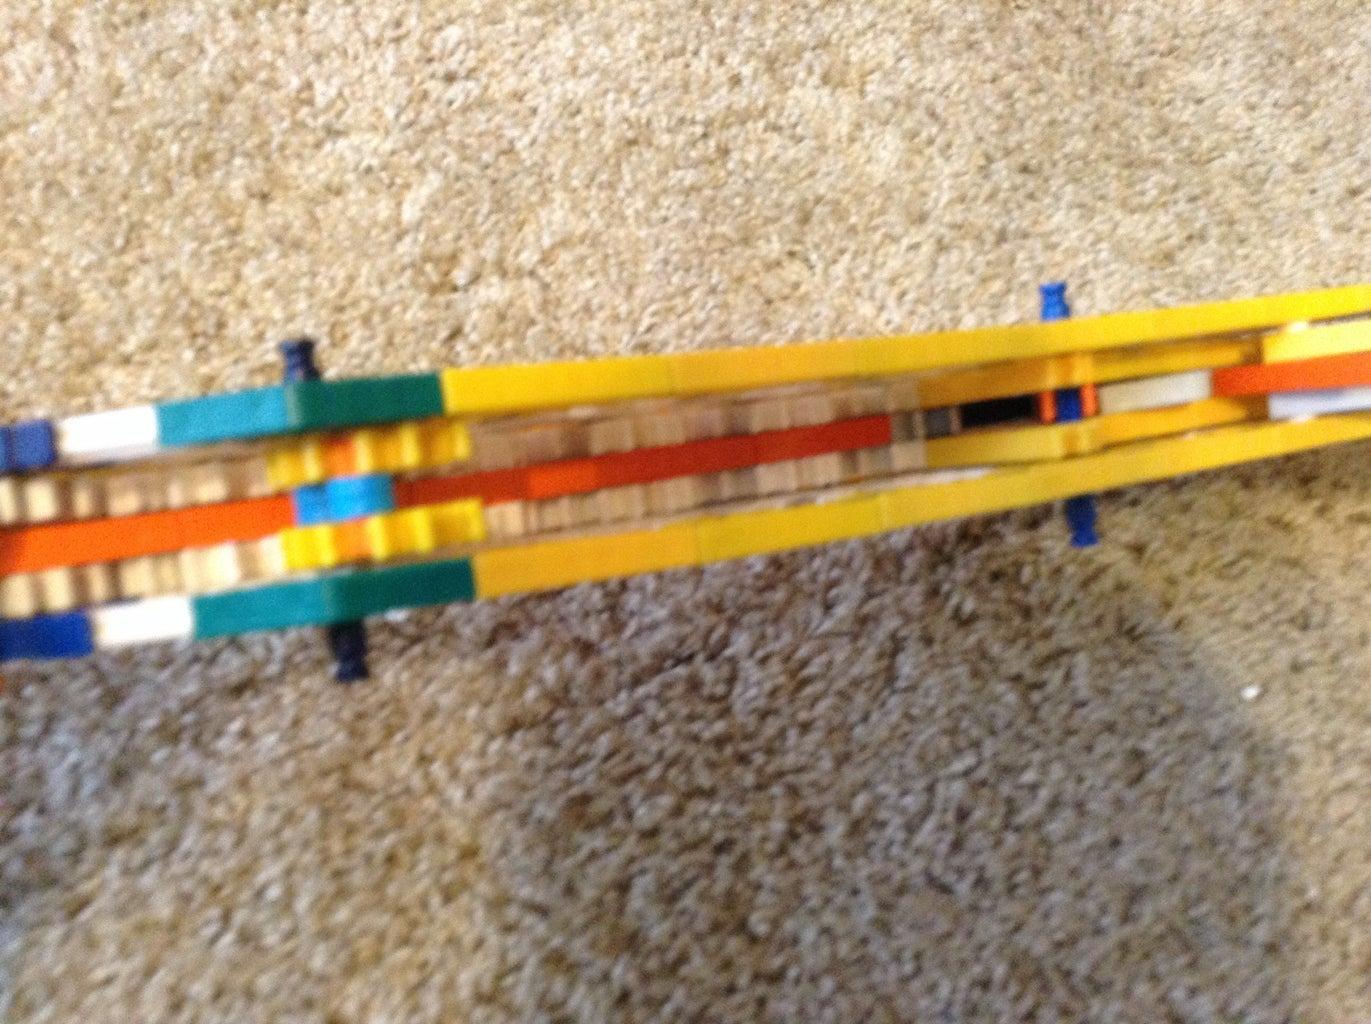 The Prototype Removable Horizontal Mag Knex Gun